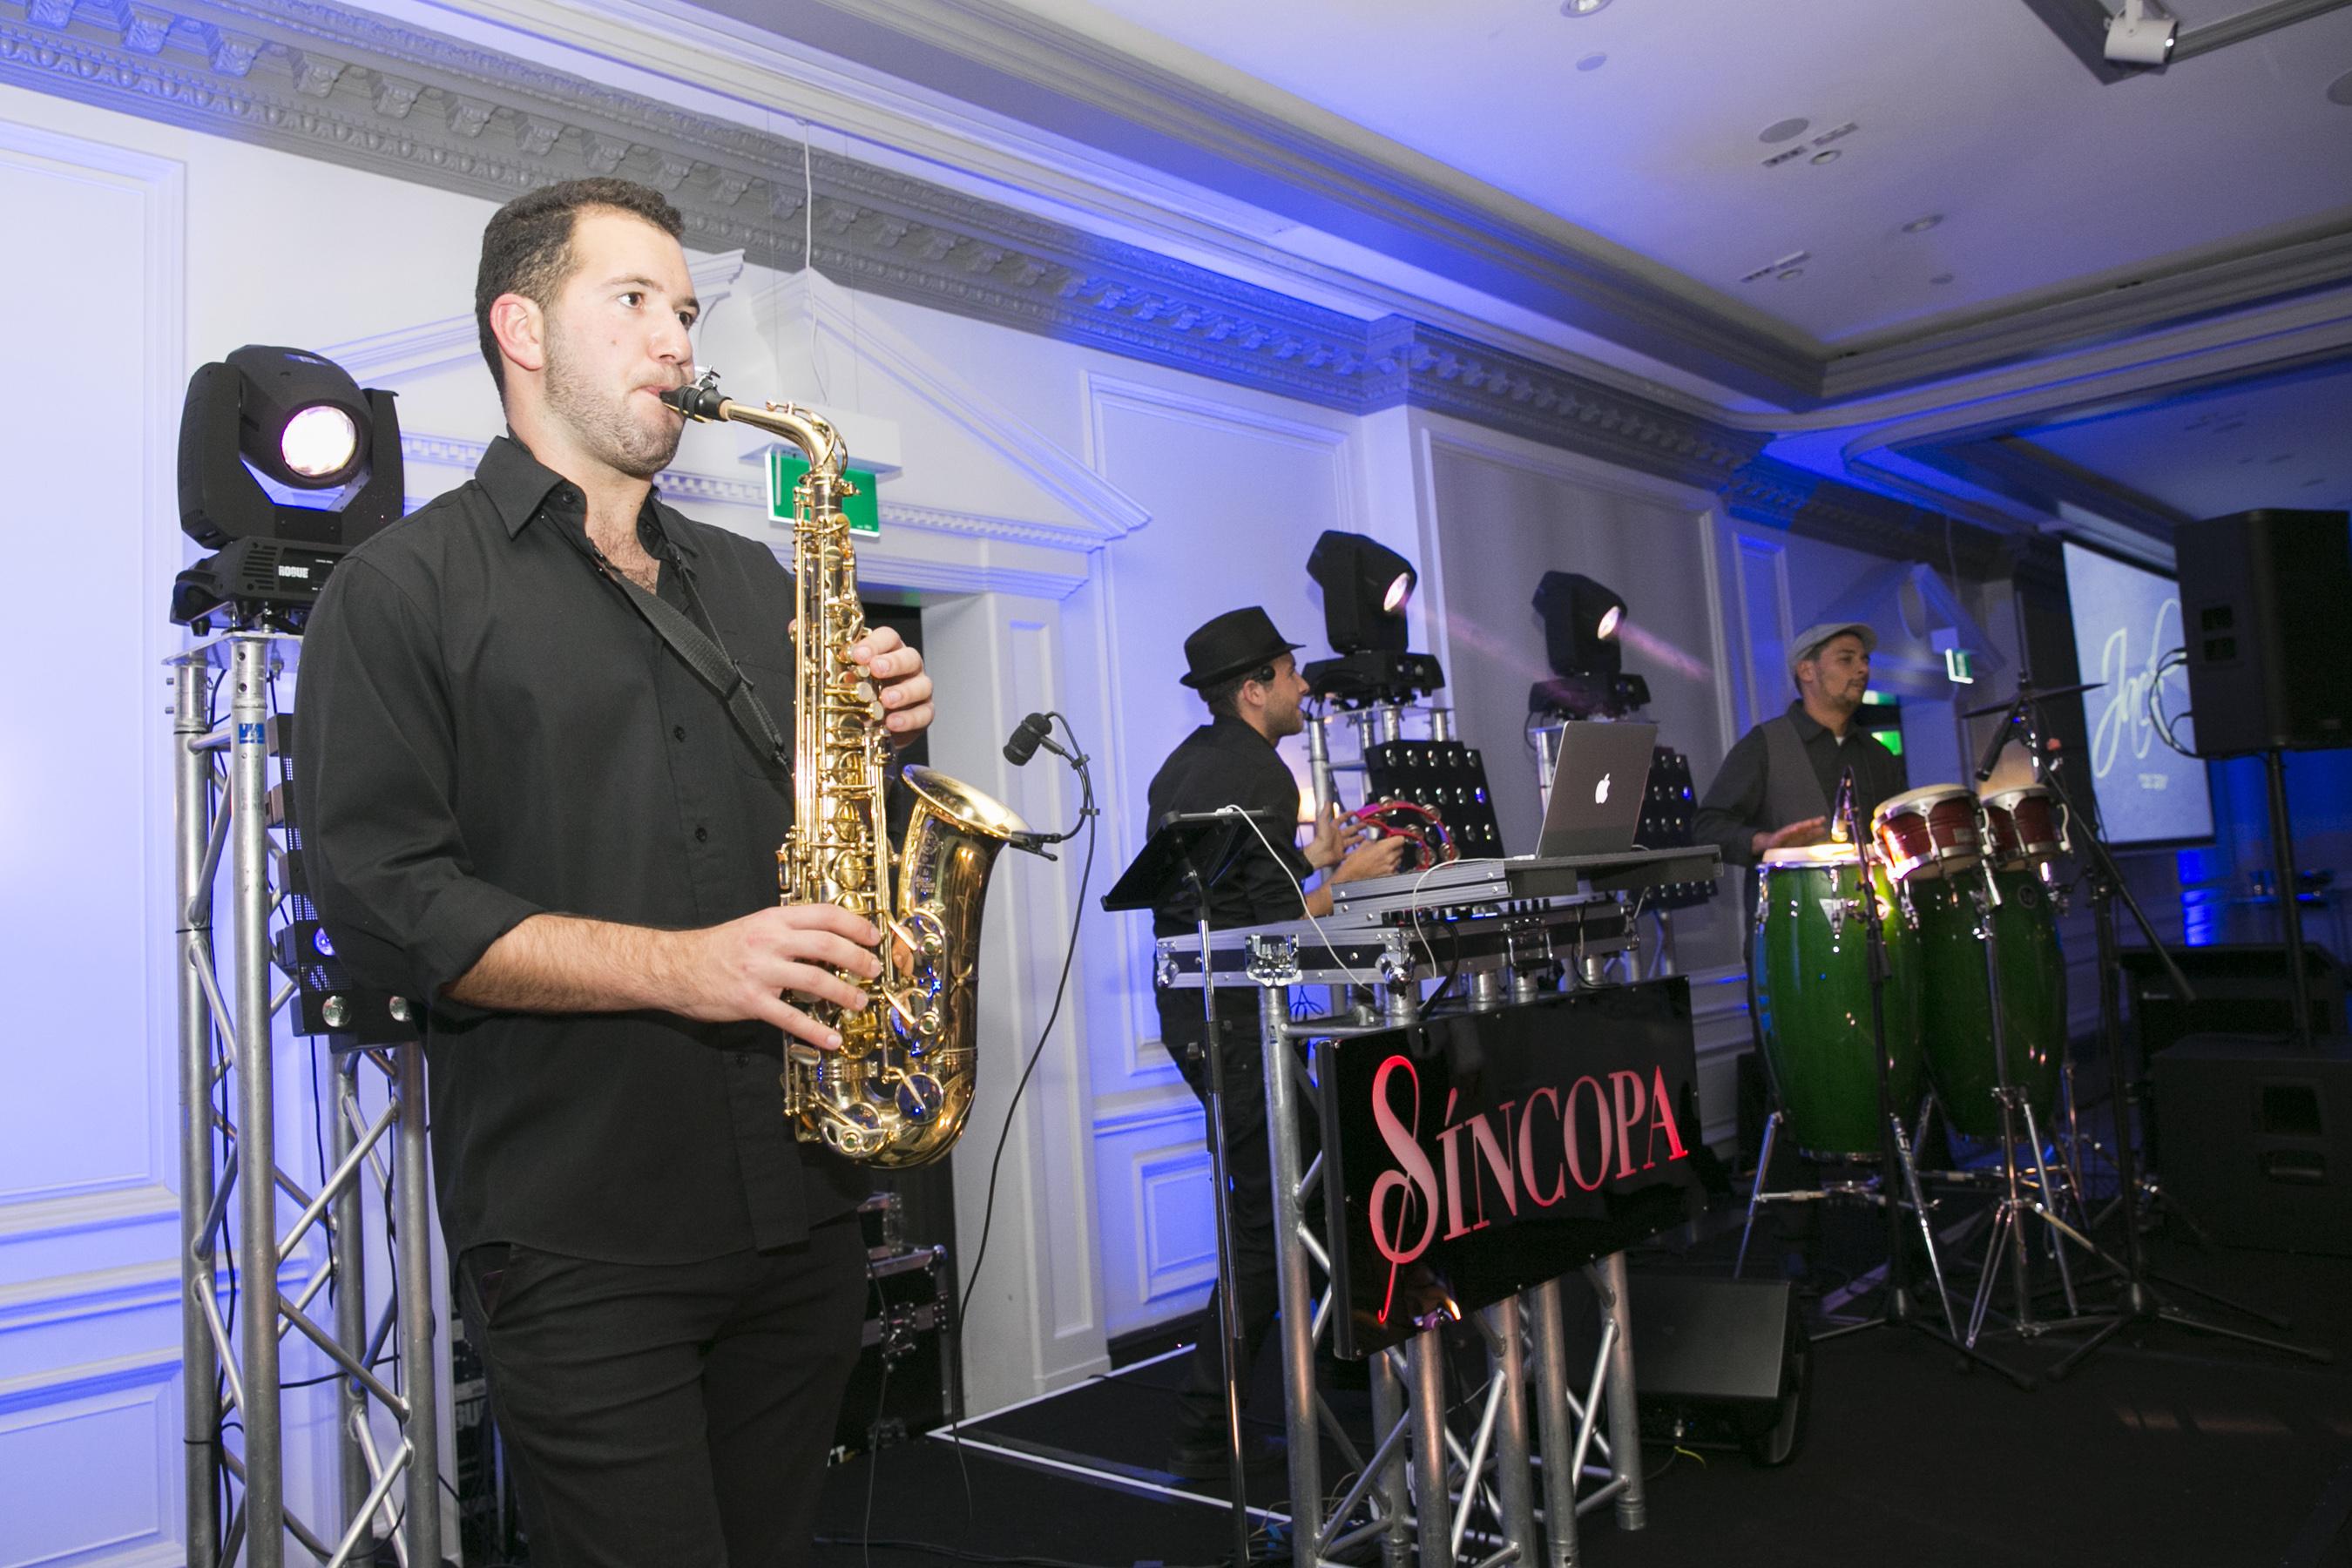 Saxophone for Sydney's Sincopa Trio